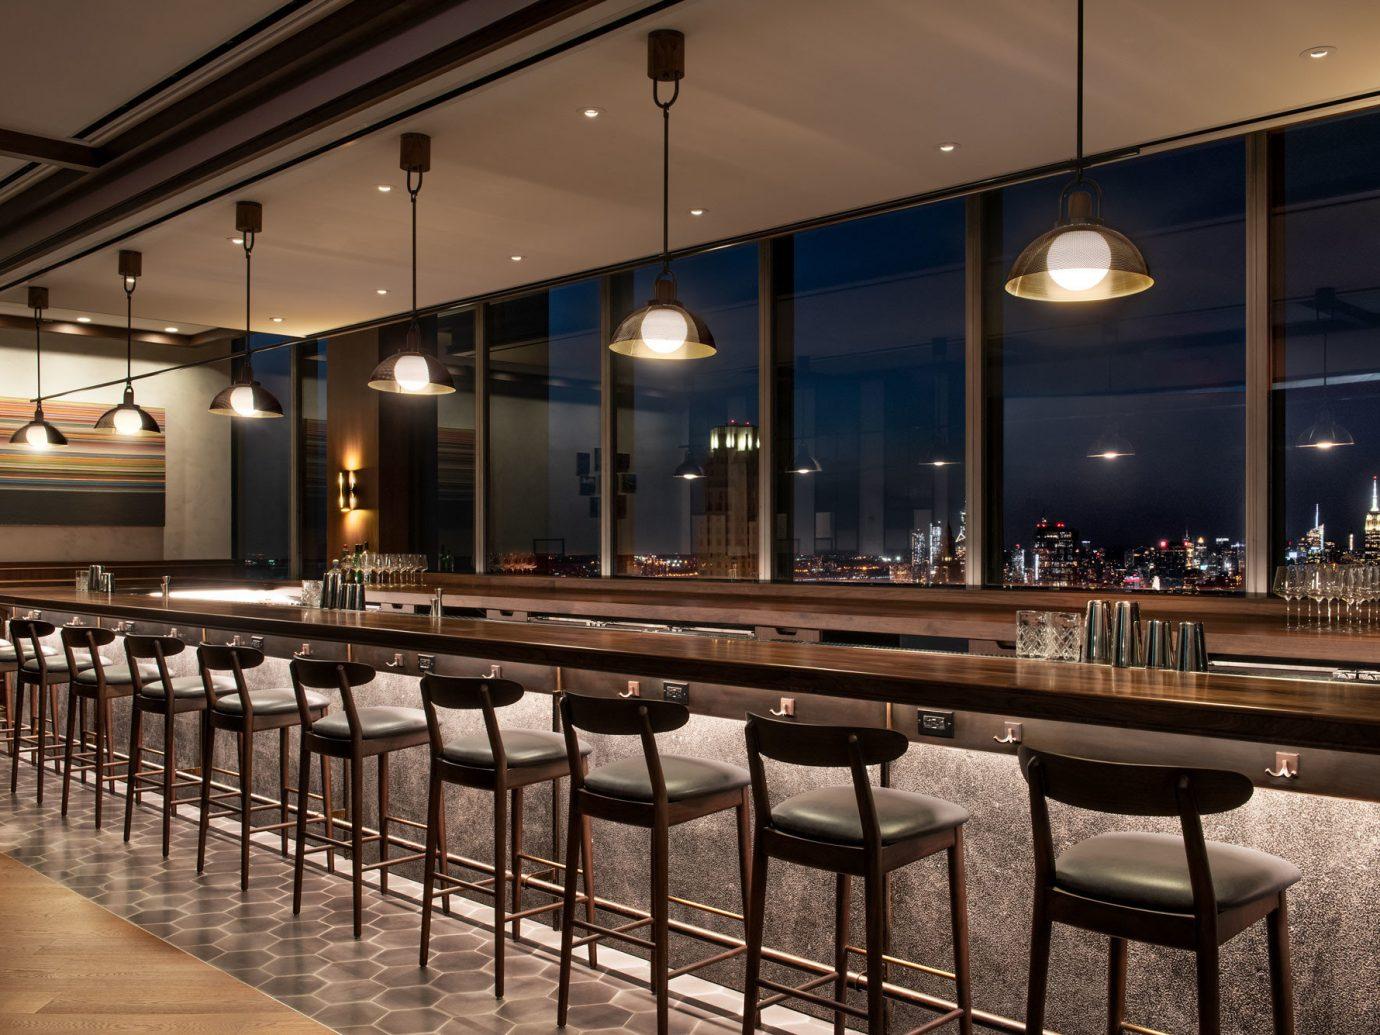 The bar at Manhatta in New York City